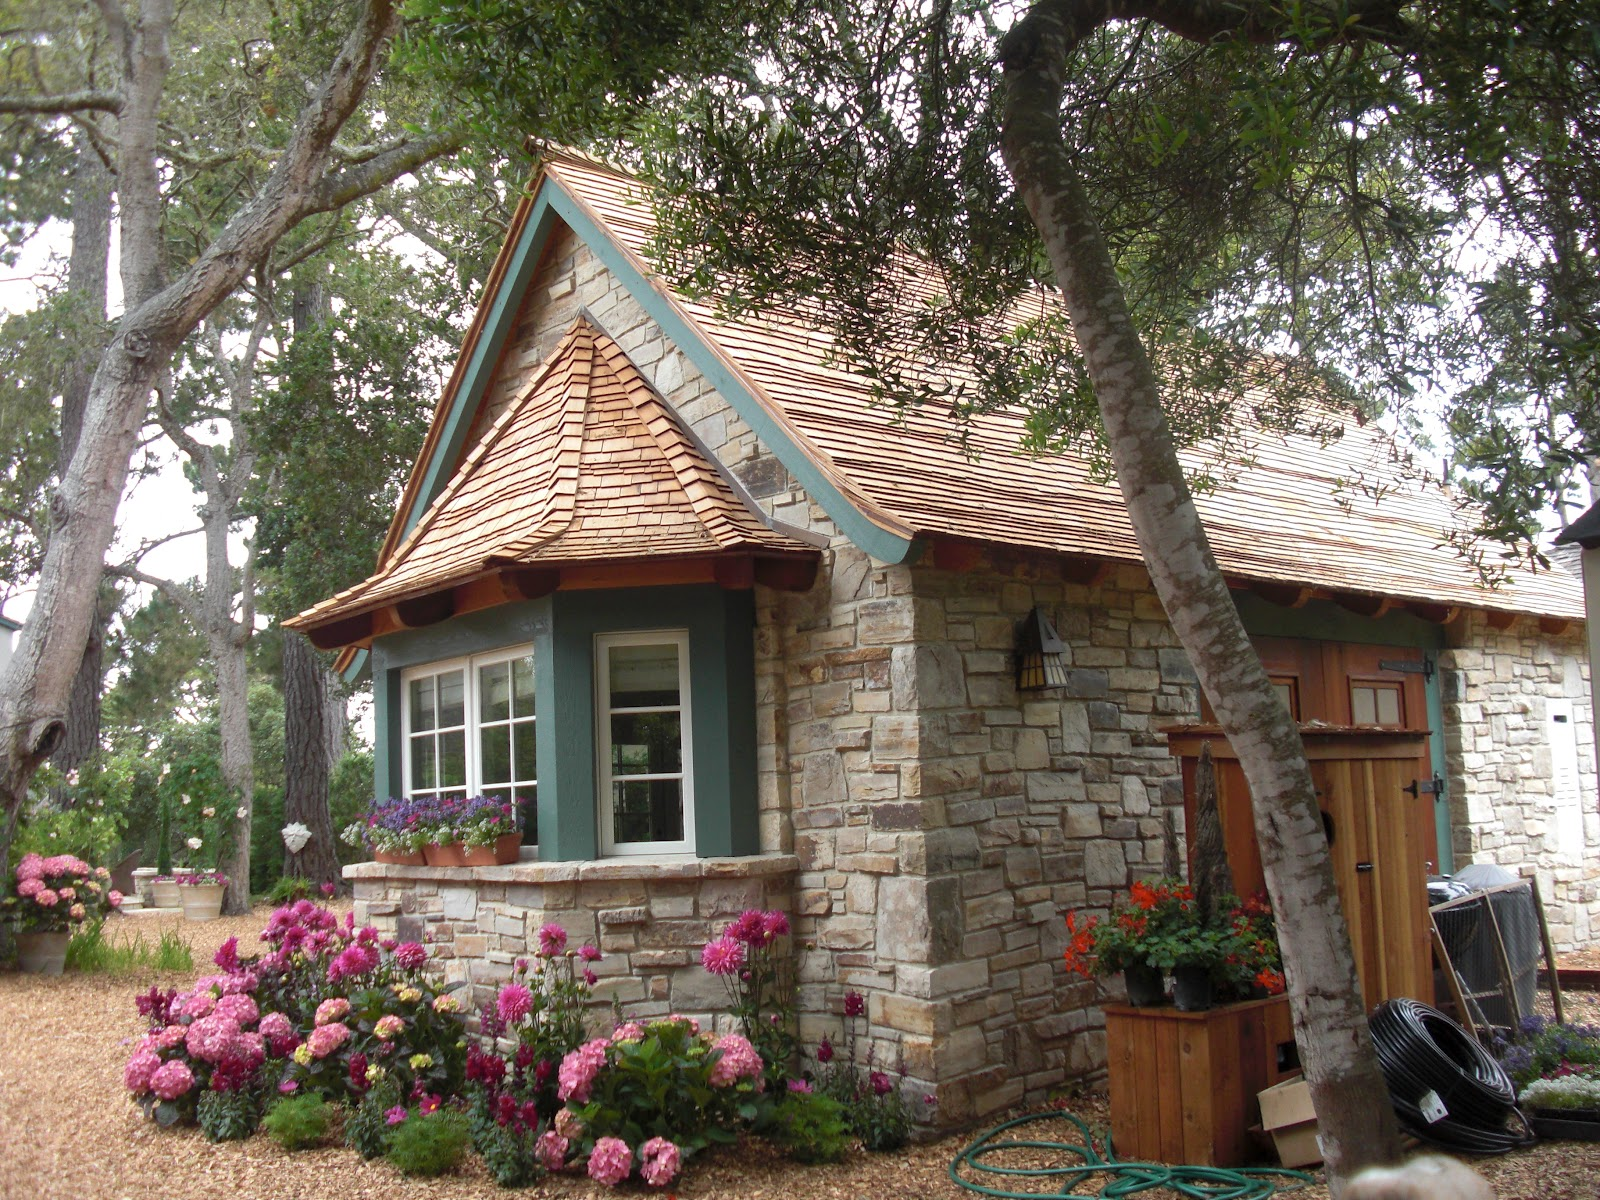 Small Tiny Bungalow House Model A67: Carmel House And Garden Tour 2012 (Hugh Comstock